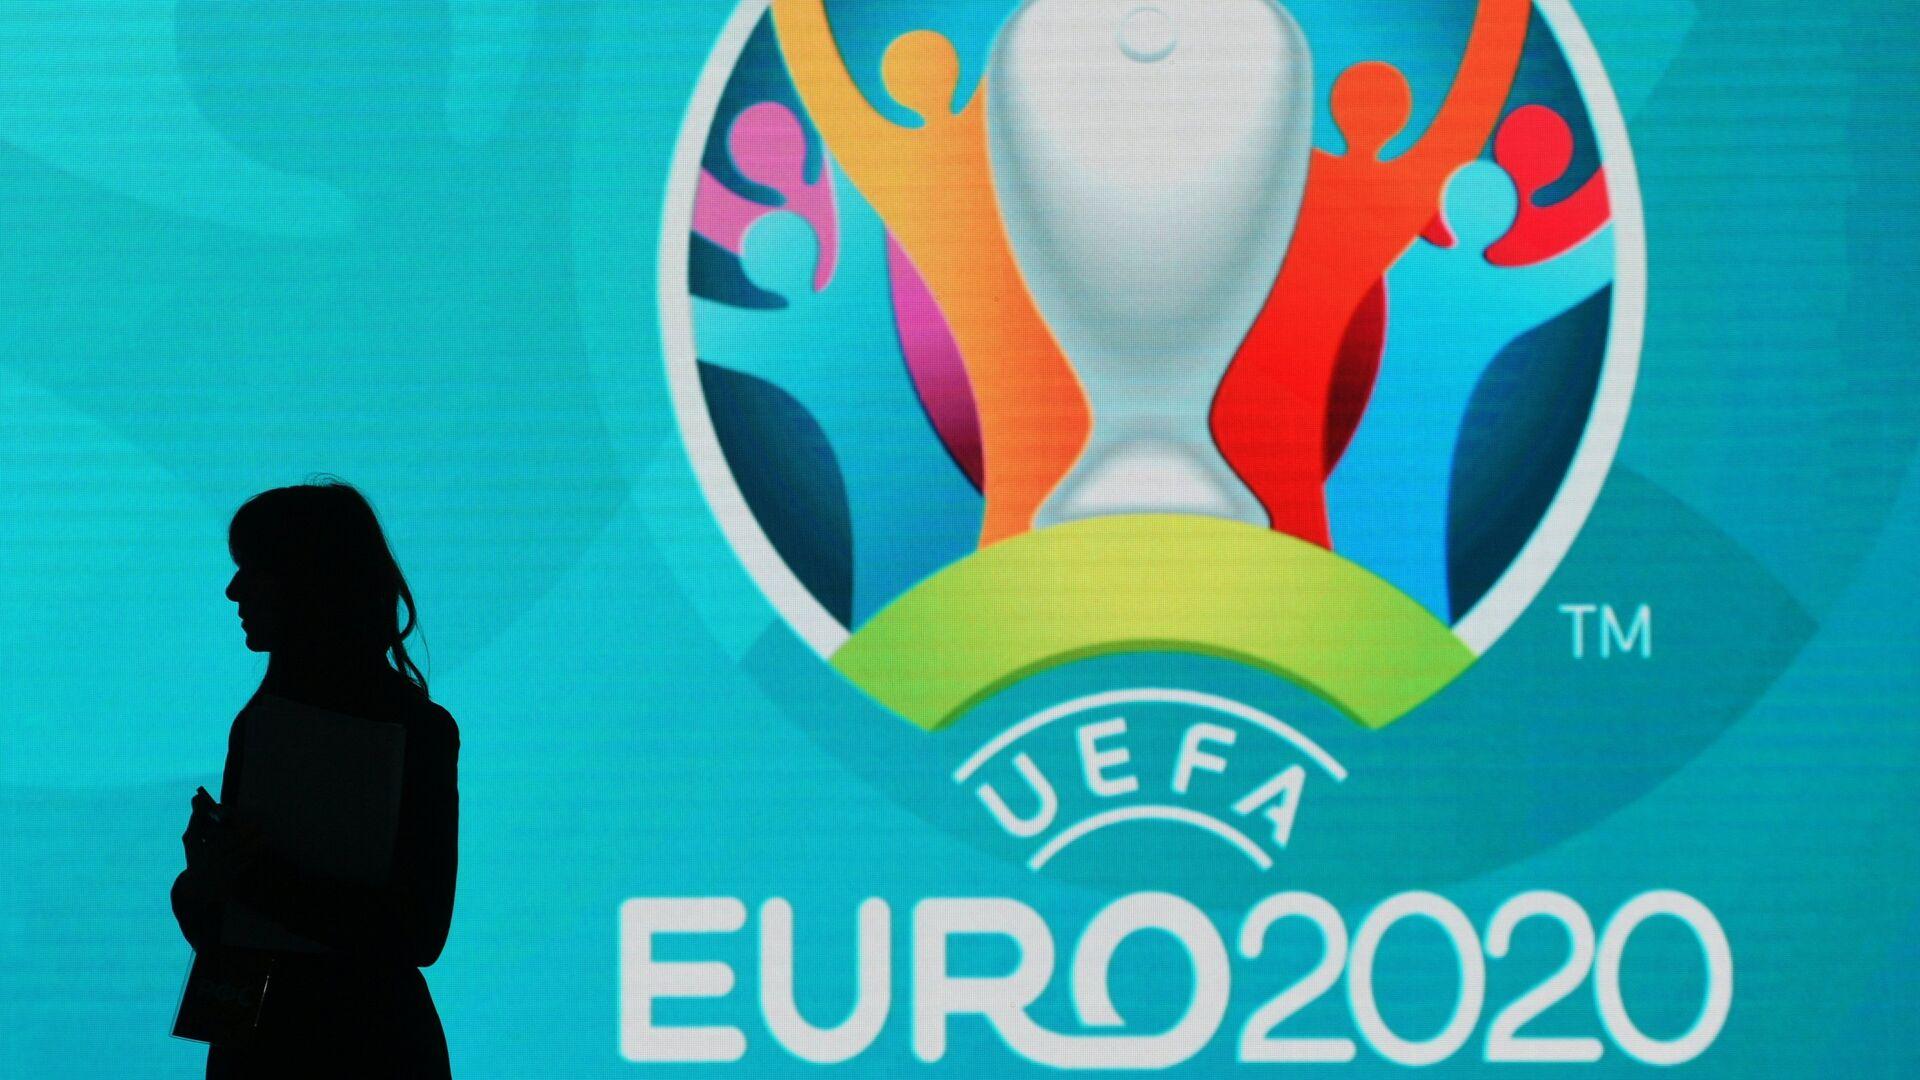 Логотип Евро-2020 по футболу - РИА Новости, 1920, 11.07.2019